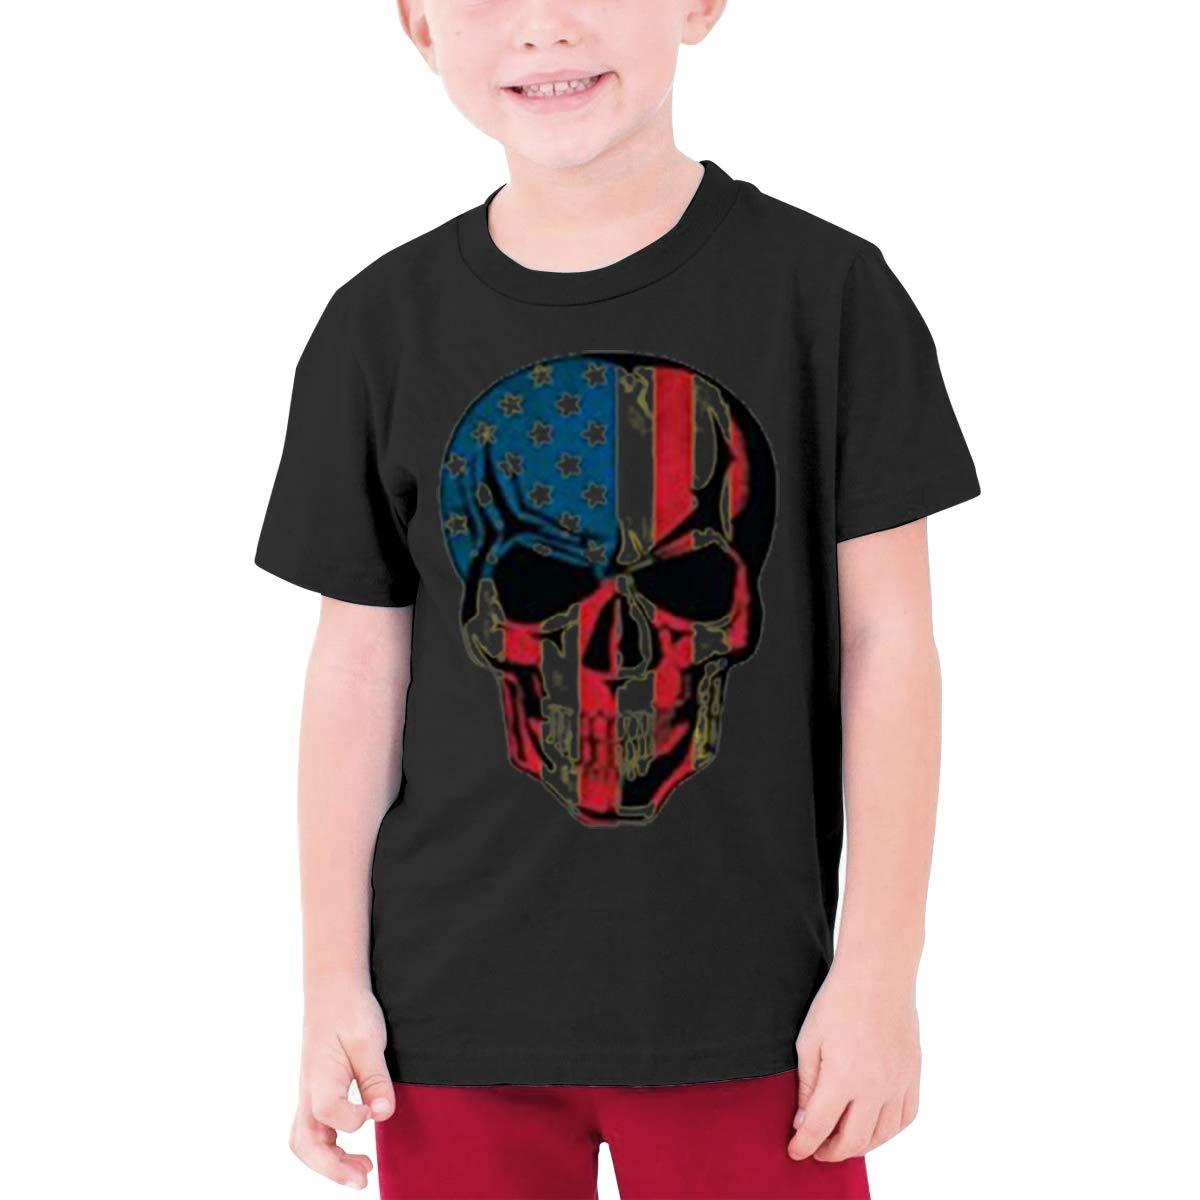 Alffe American-Flag-Skull T-Shirt Boy Kids O-Neck 3D Printing Youth Fashion Tops